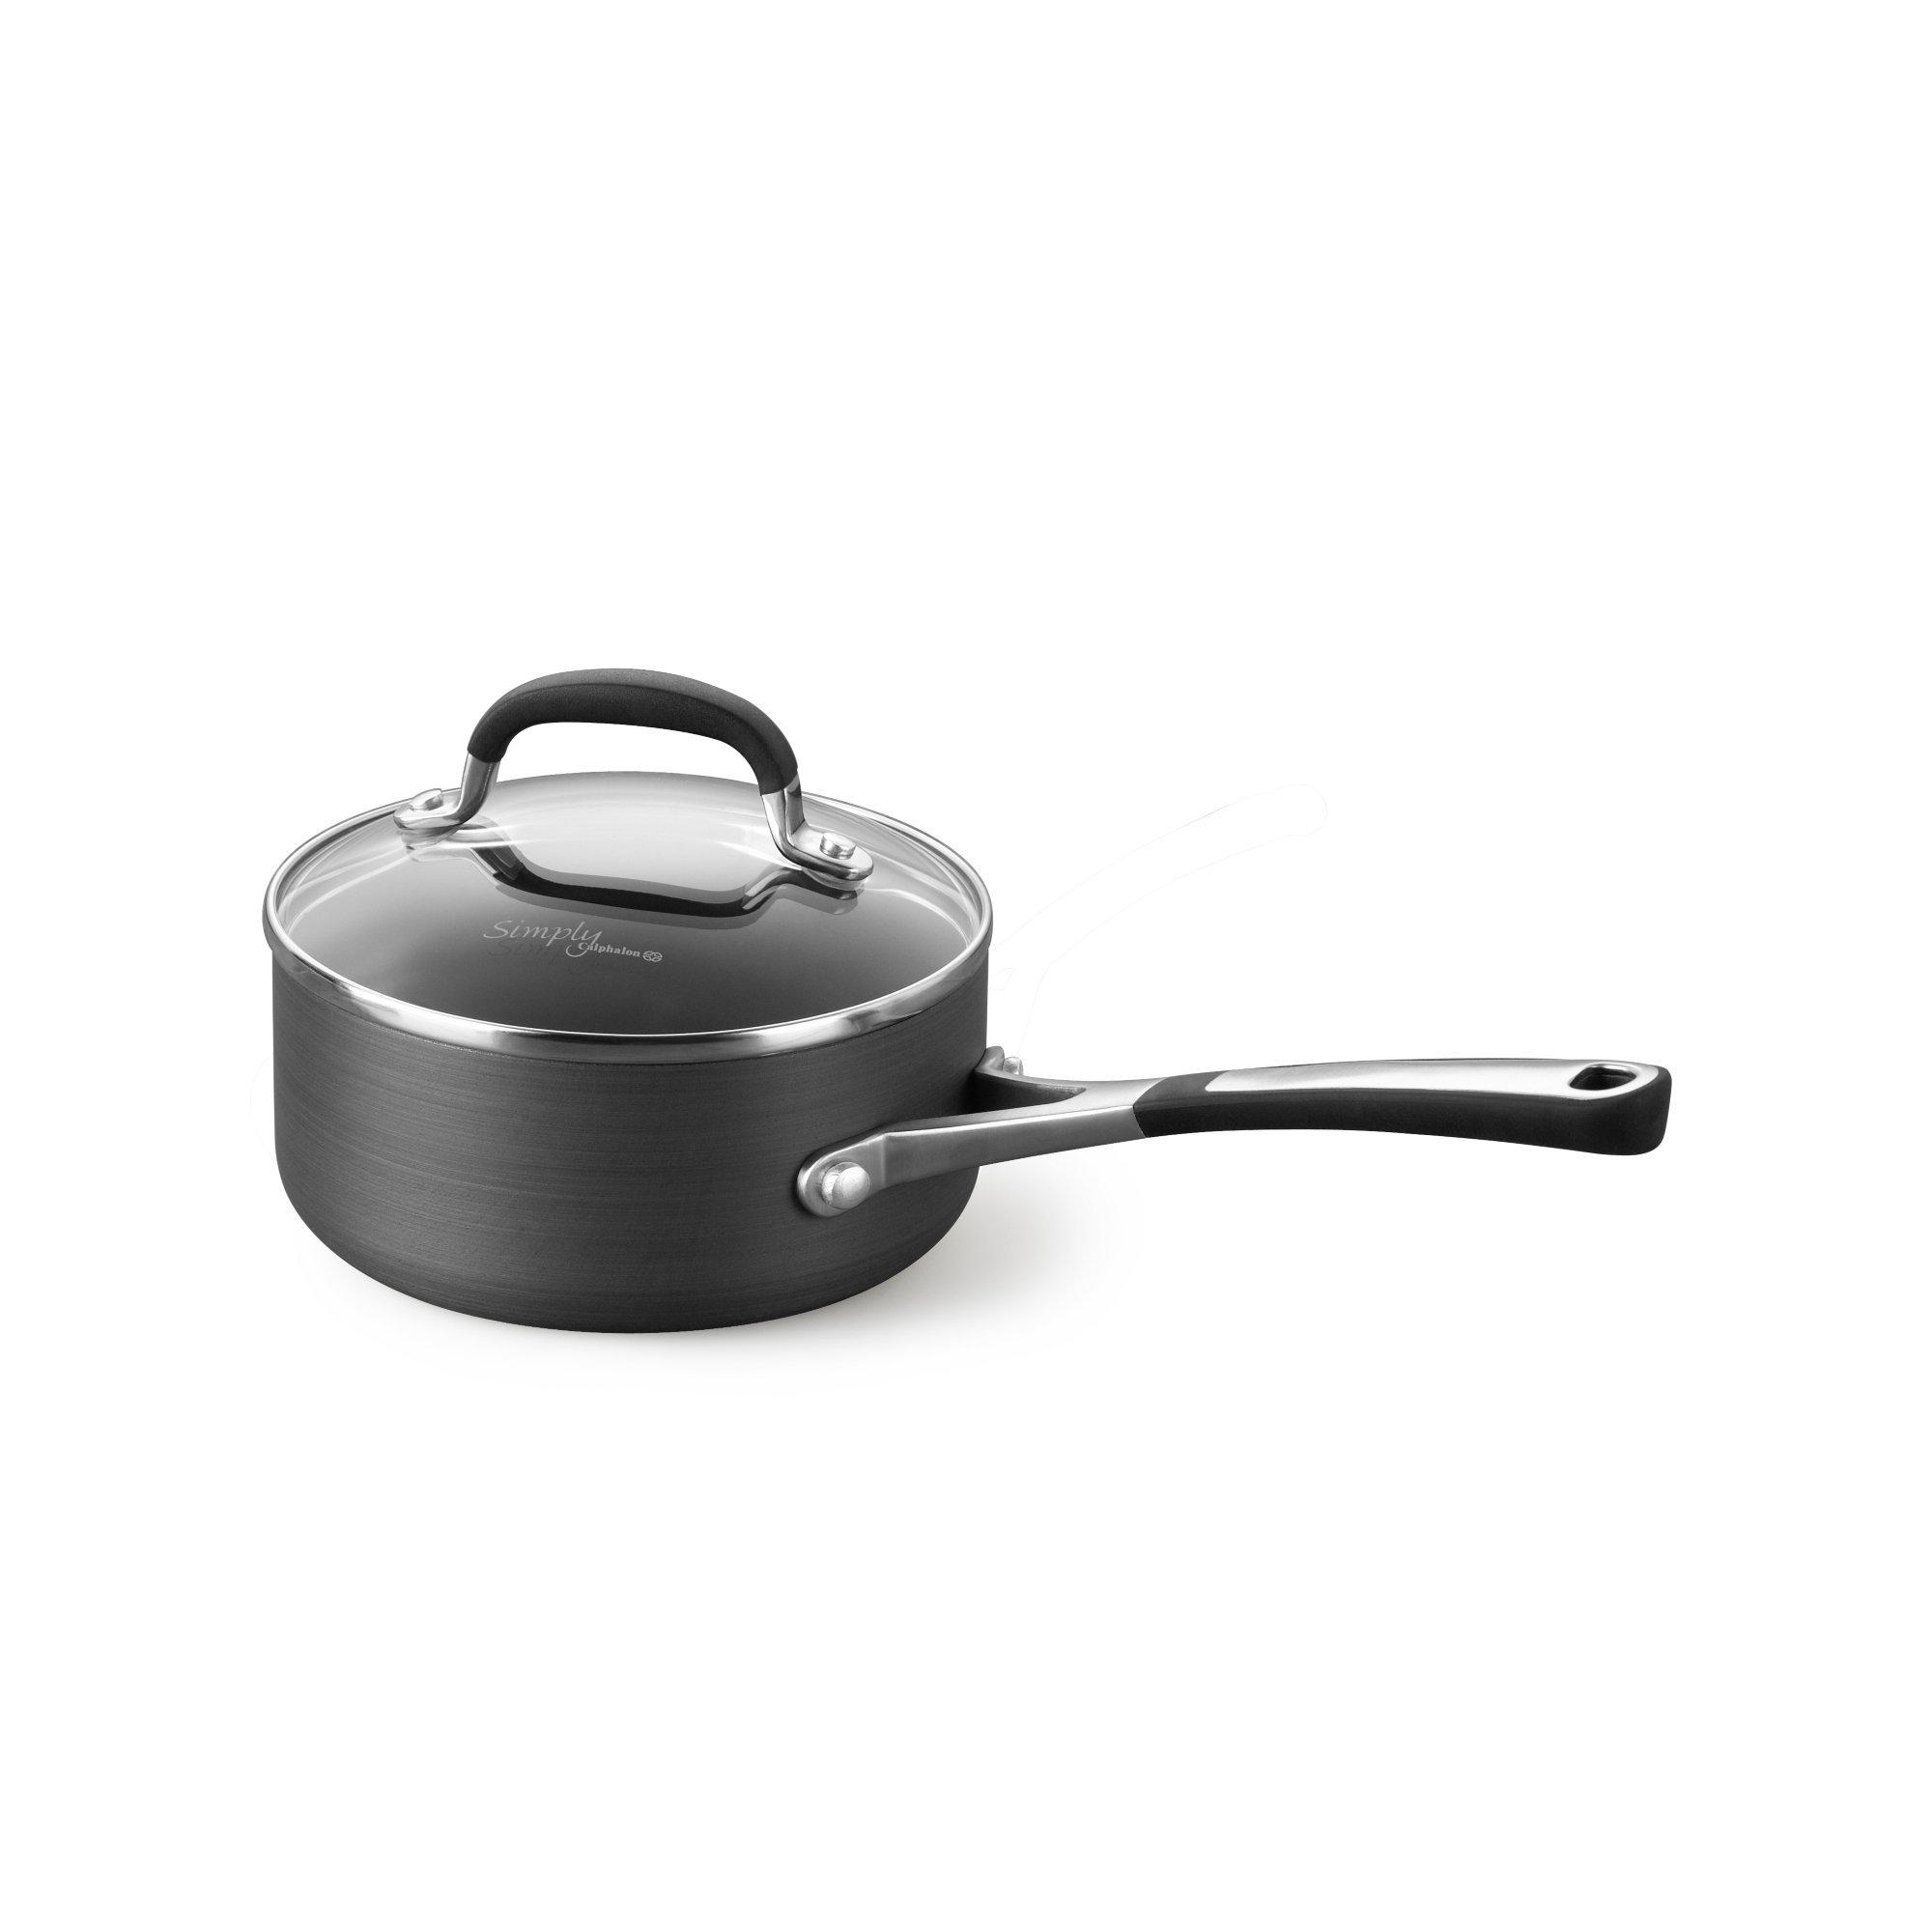 Simply Calphalon Nonstick 2-Quart Saucepan with Cover